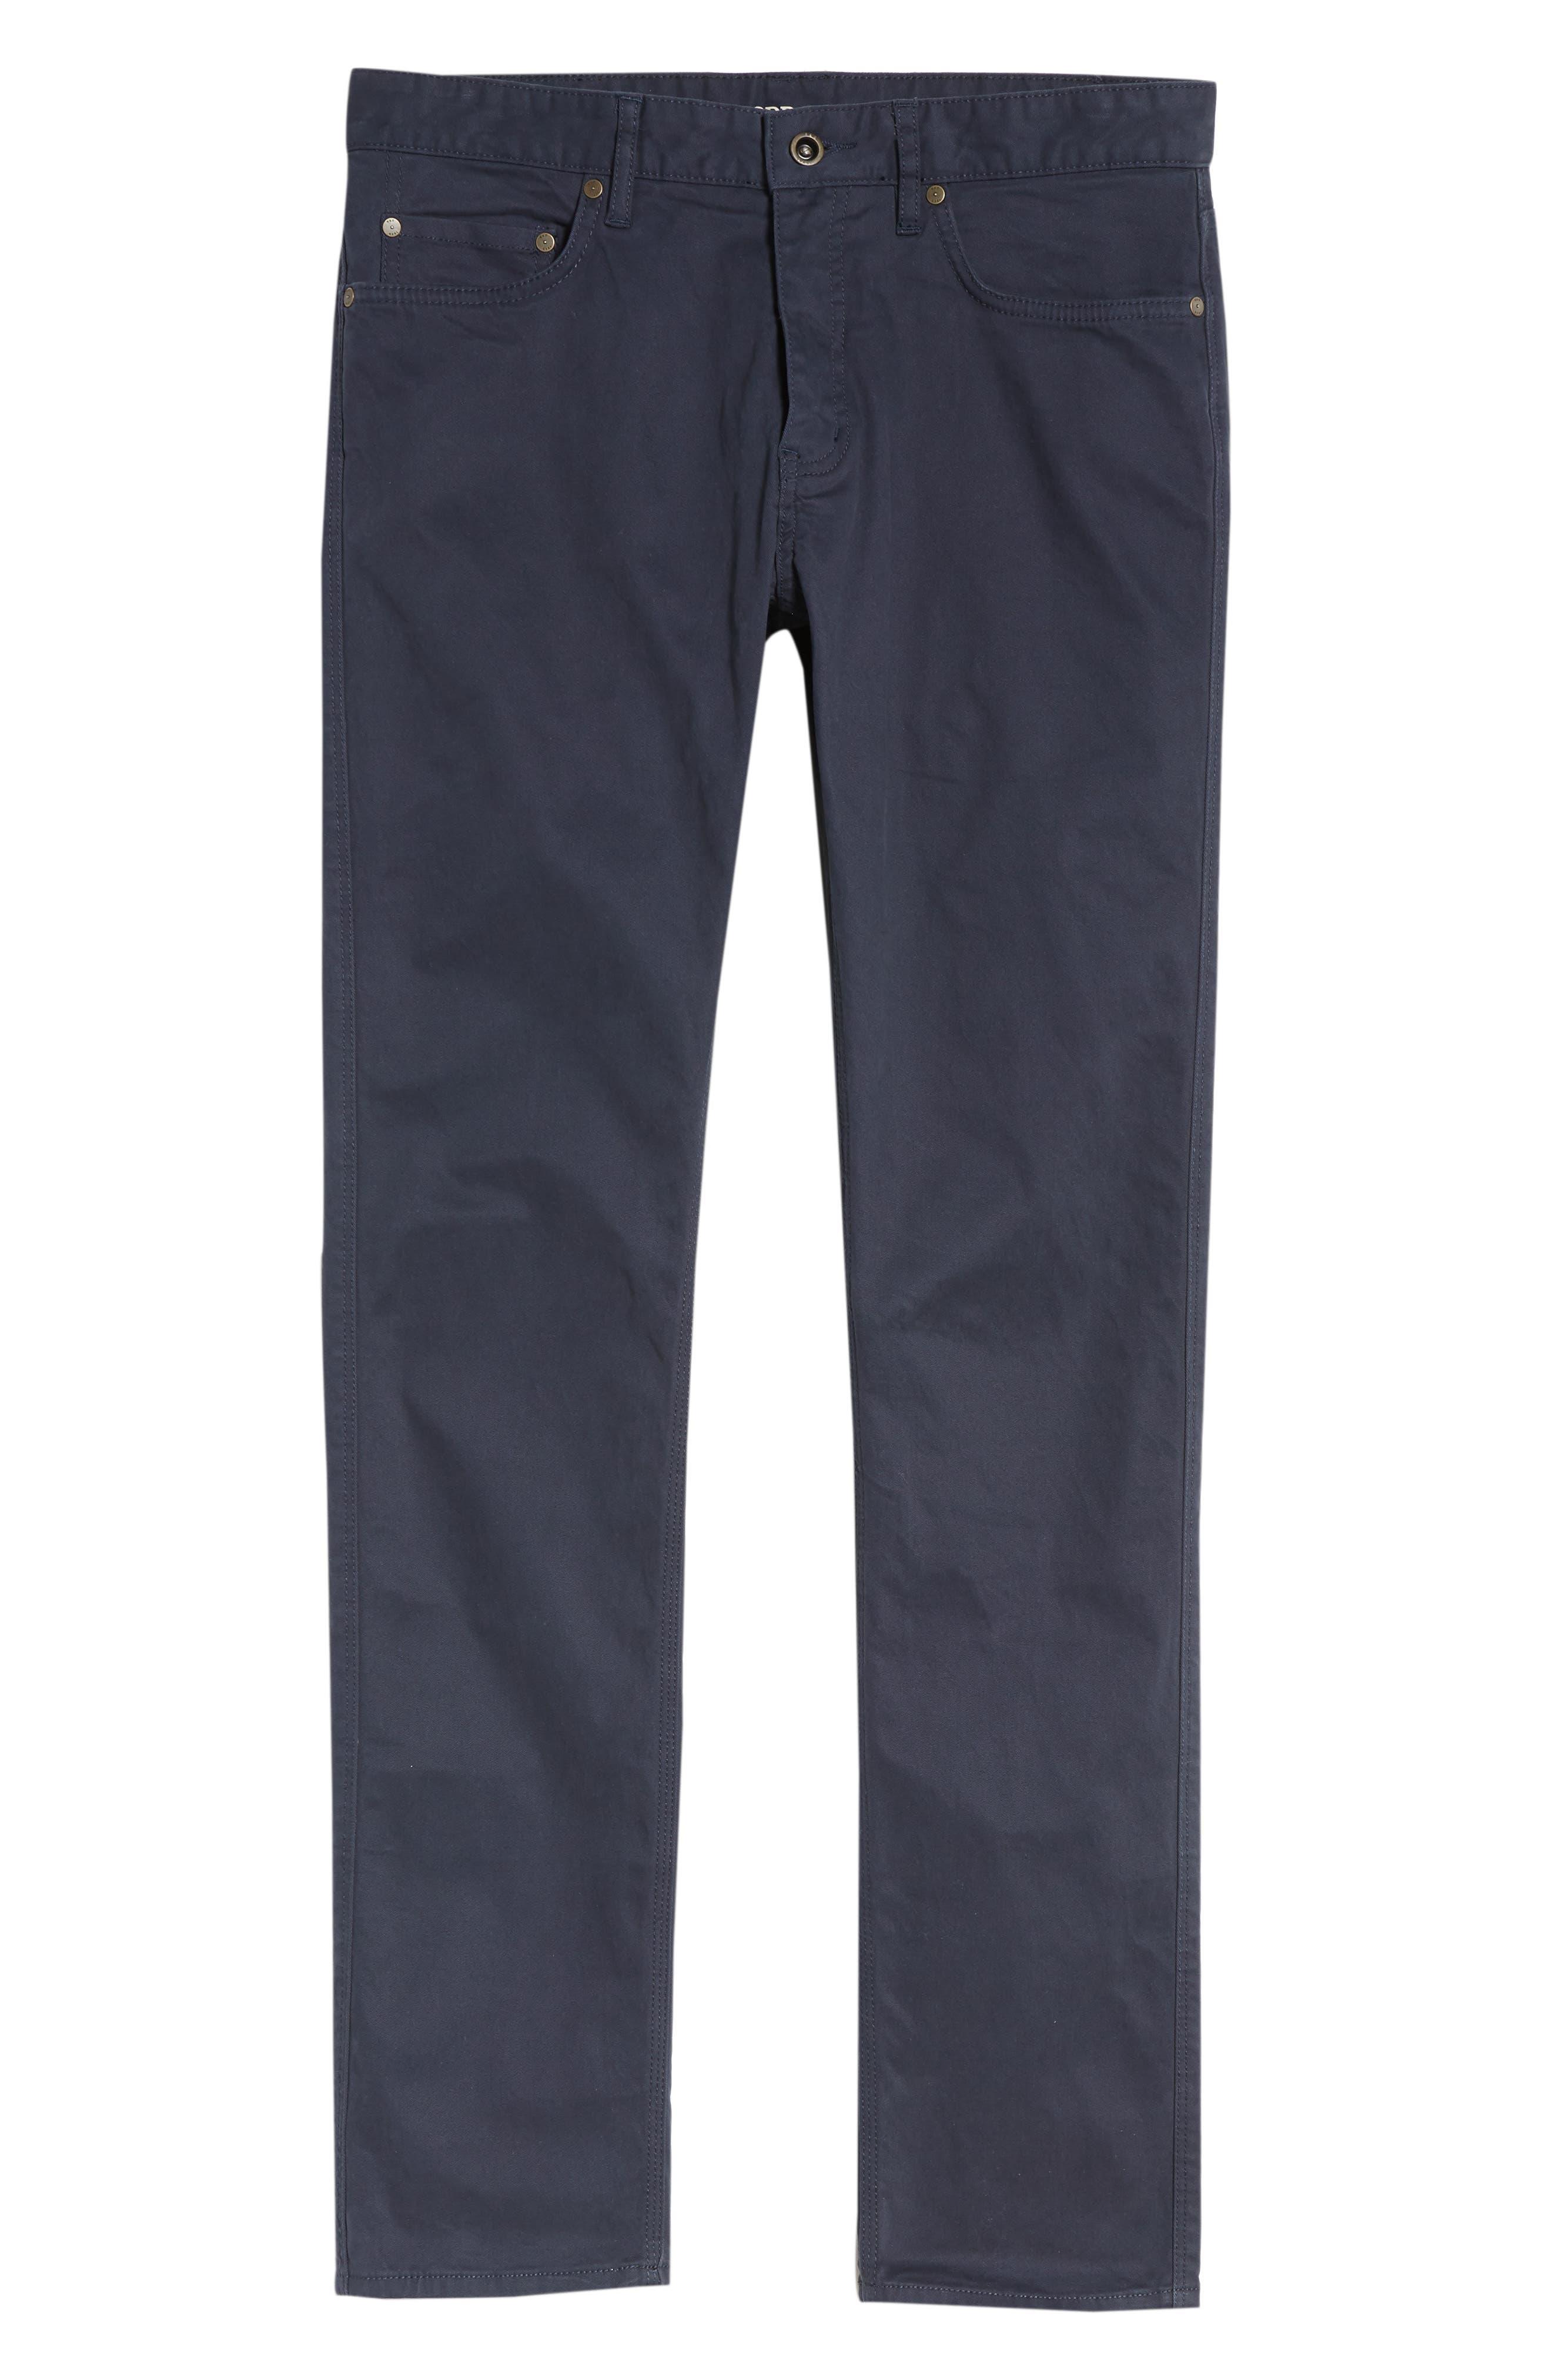 Fencourt Regular Fit Straight Leg Jeans,                             Alternate thumbnail 6, color,                             MIDNIGHT